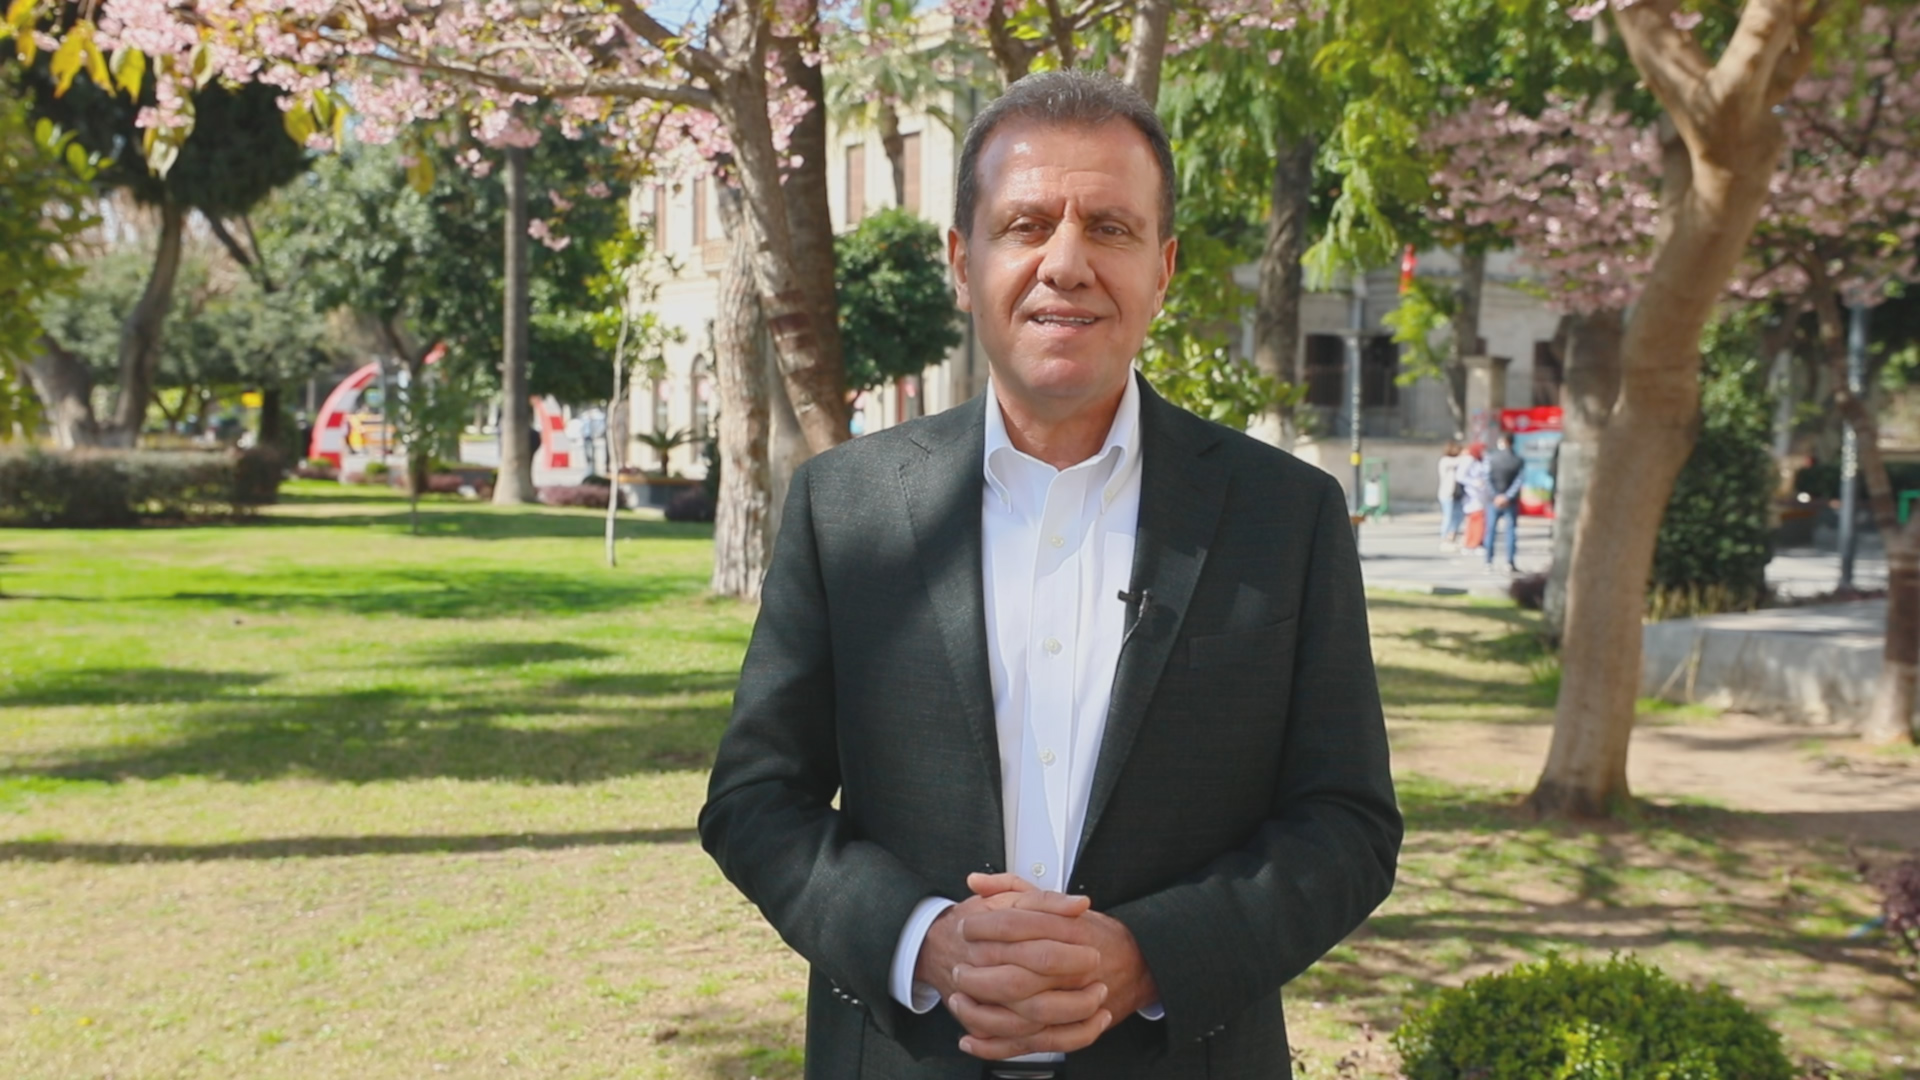 BAŞKAN SEÇER, TRAVEL TURKEY İZMİR FUARI'NDA MERSİN'İ TANITTI